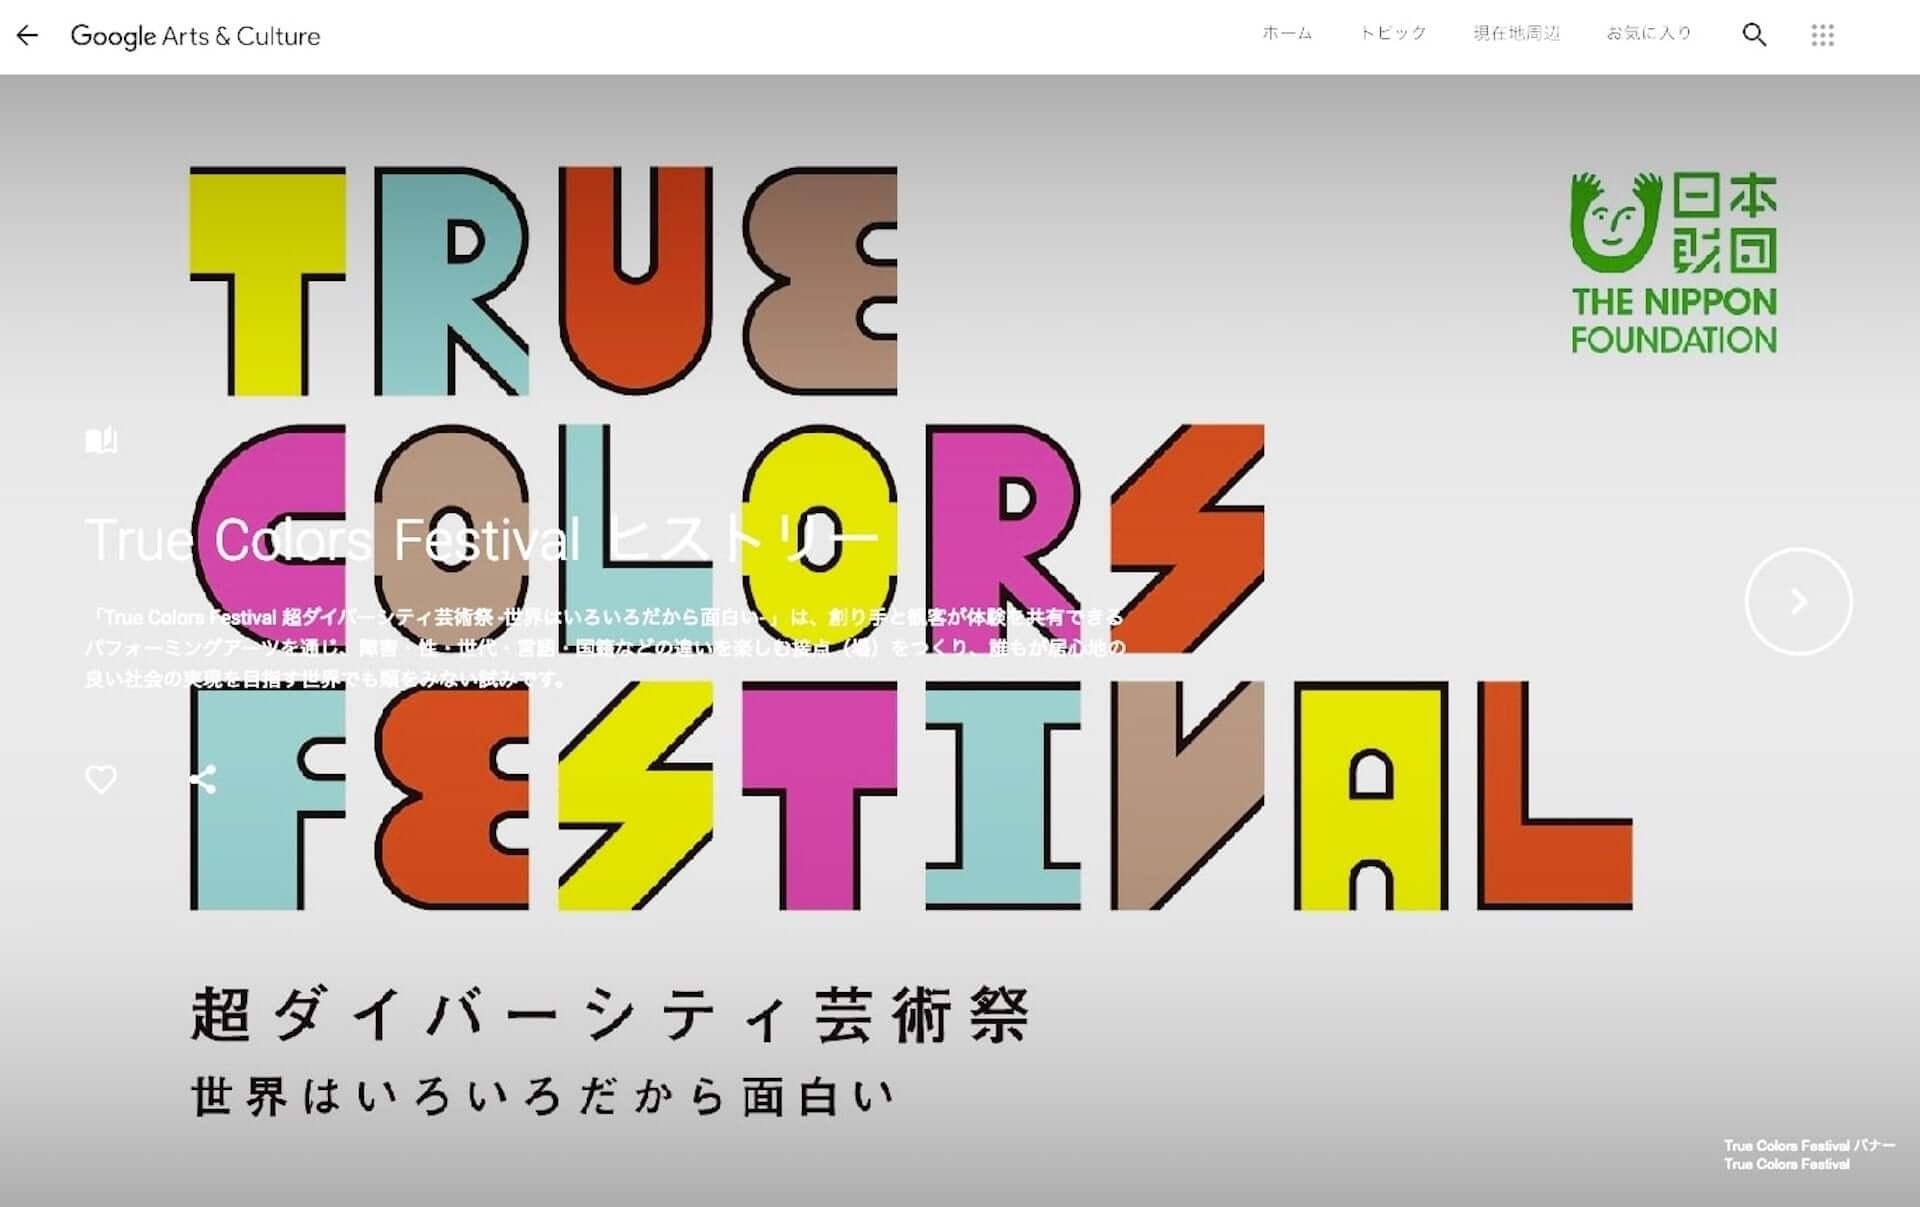 <True Colors Festival -超ダイバーシティ芸術祭->のオンライン展示が開始|ダンスやミュージカルなどの記録映像が公開 art200521_truecolors_fes_4-1920x1207